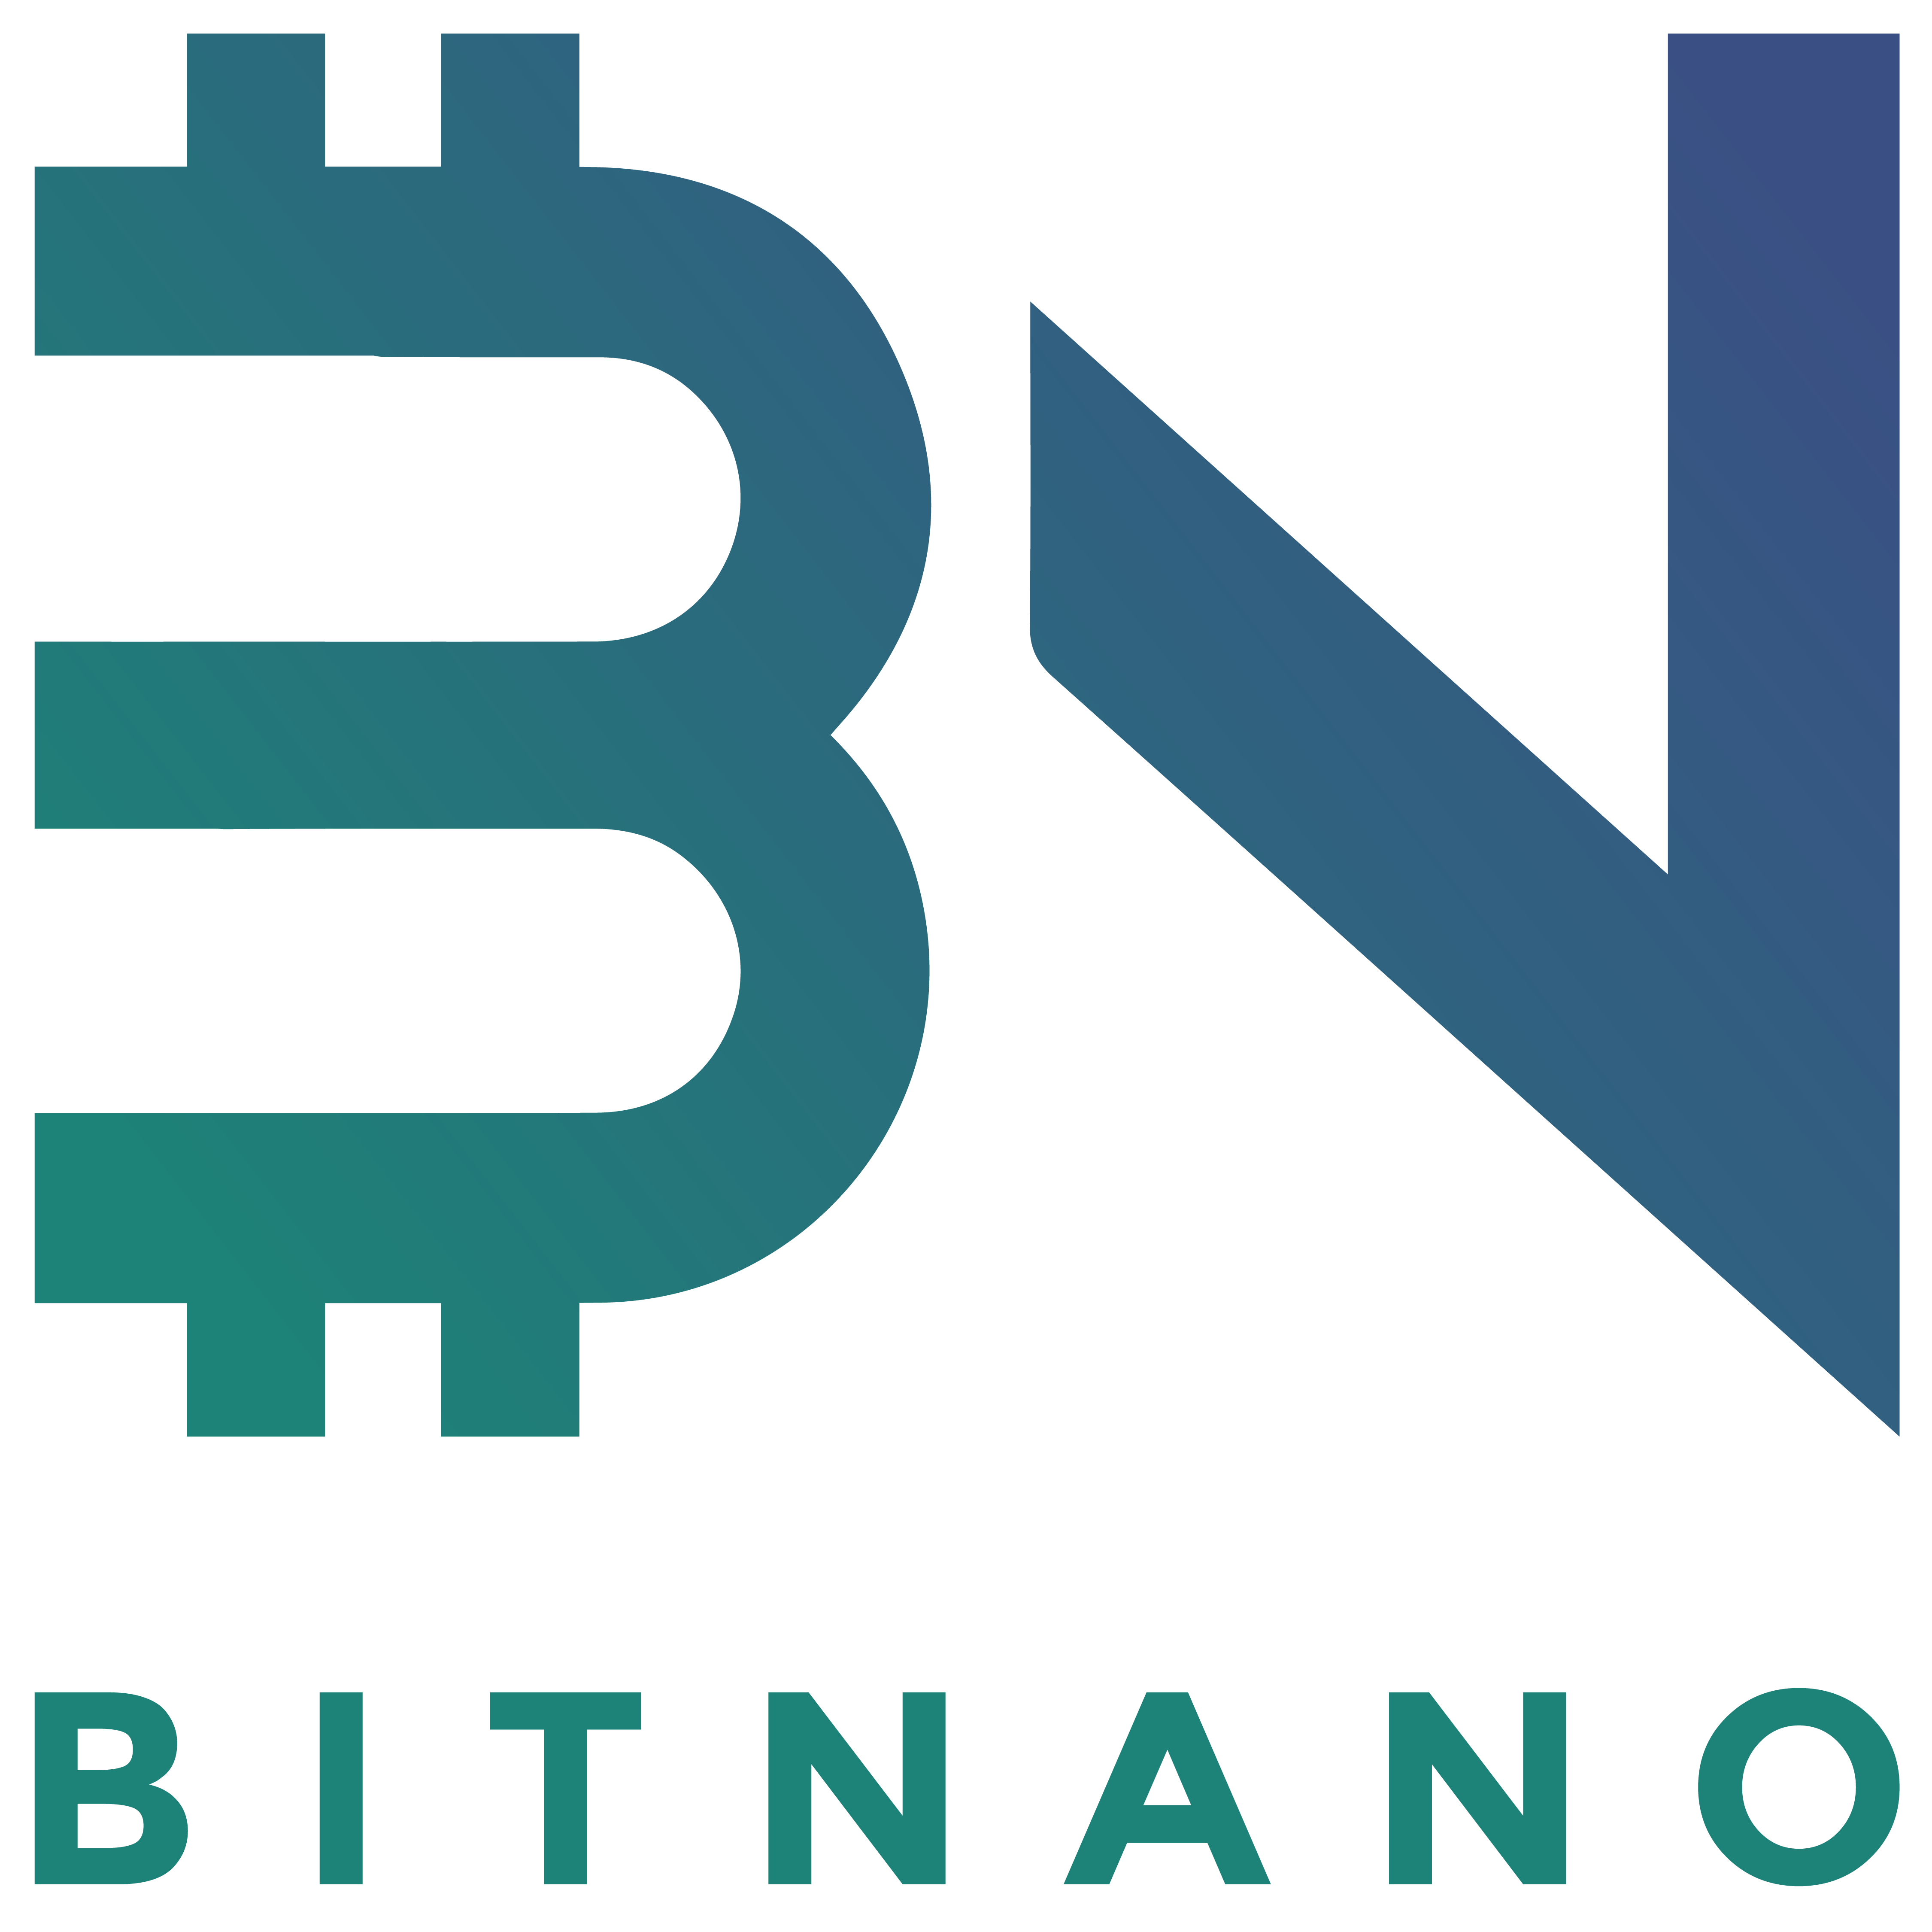 ellenőrizze a bitcoin címét bitcoin core export privát kulcs